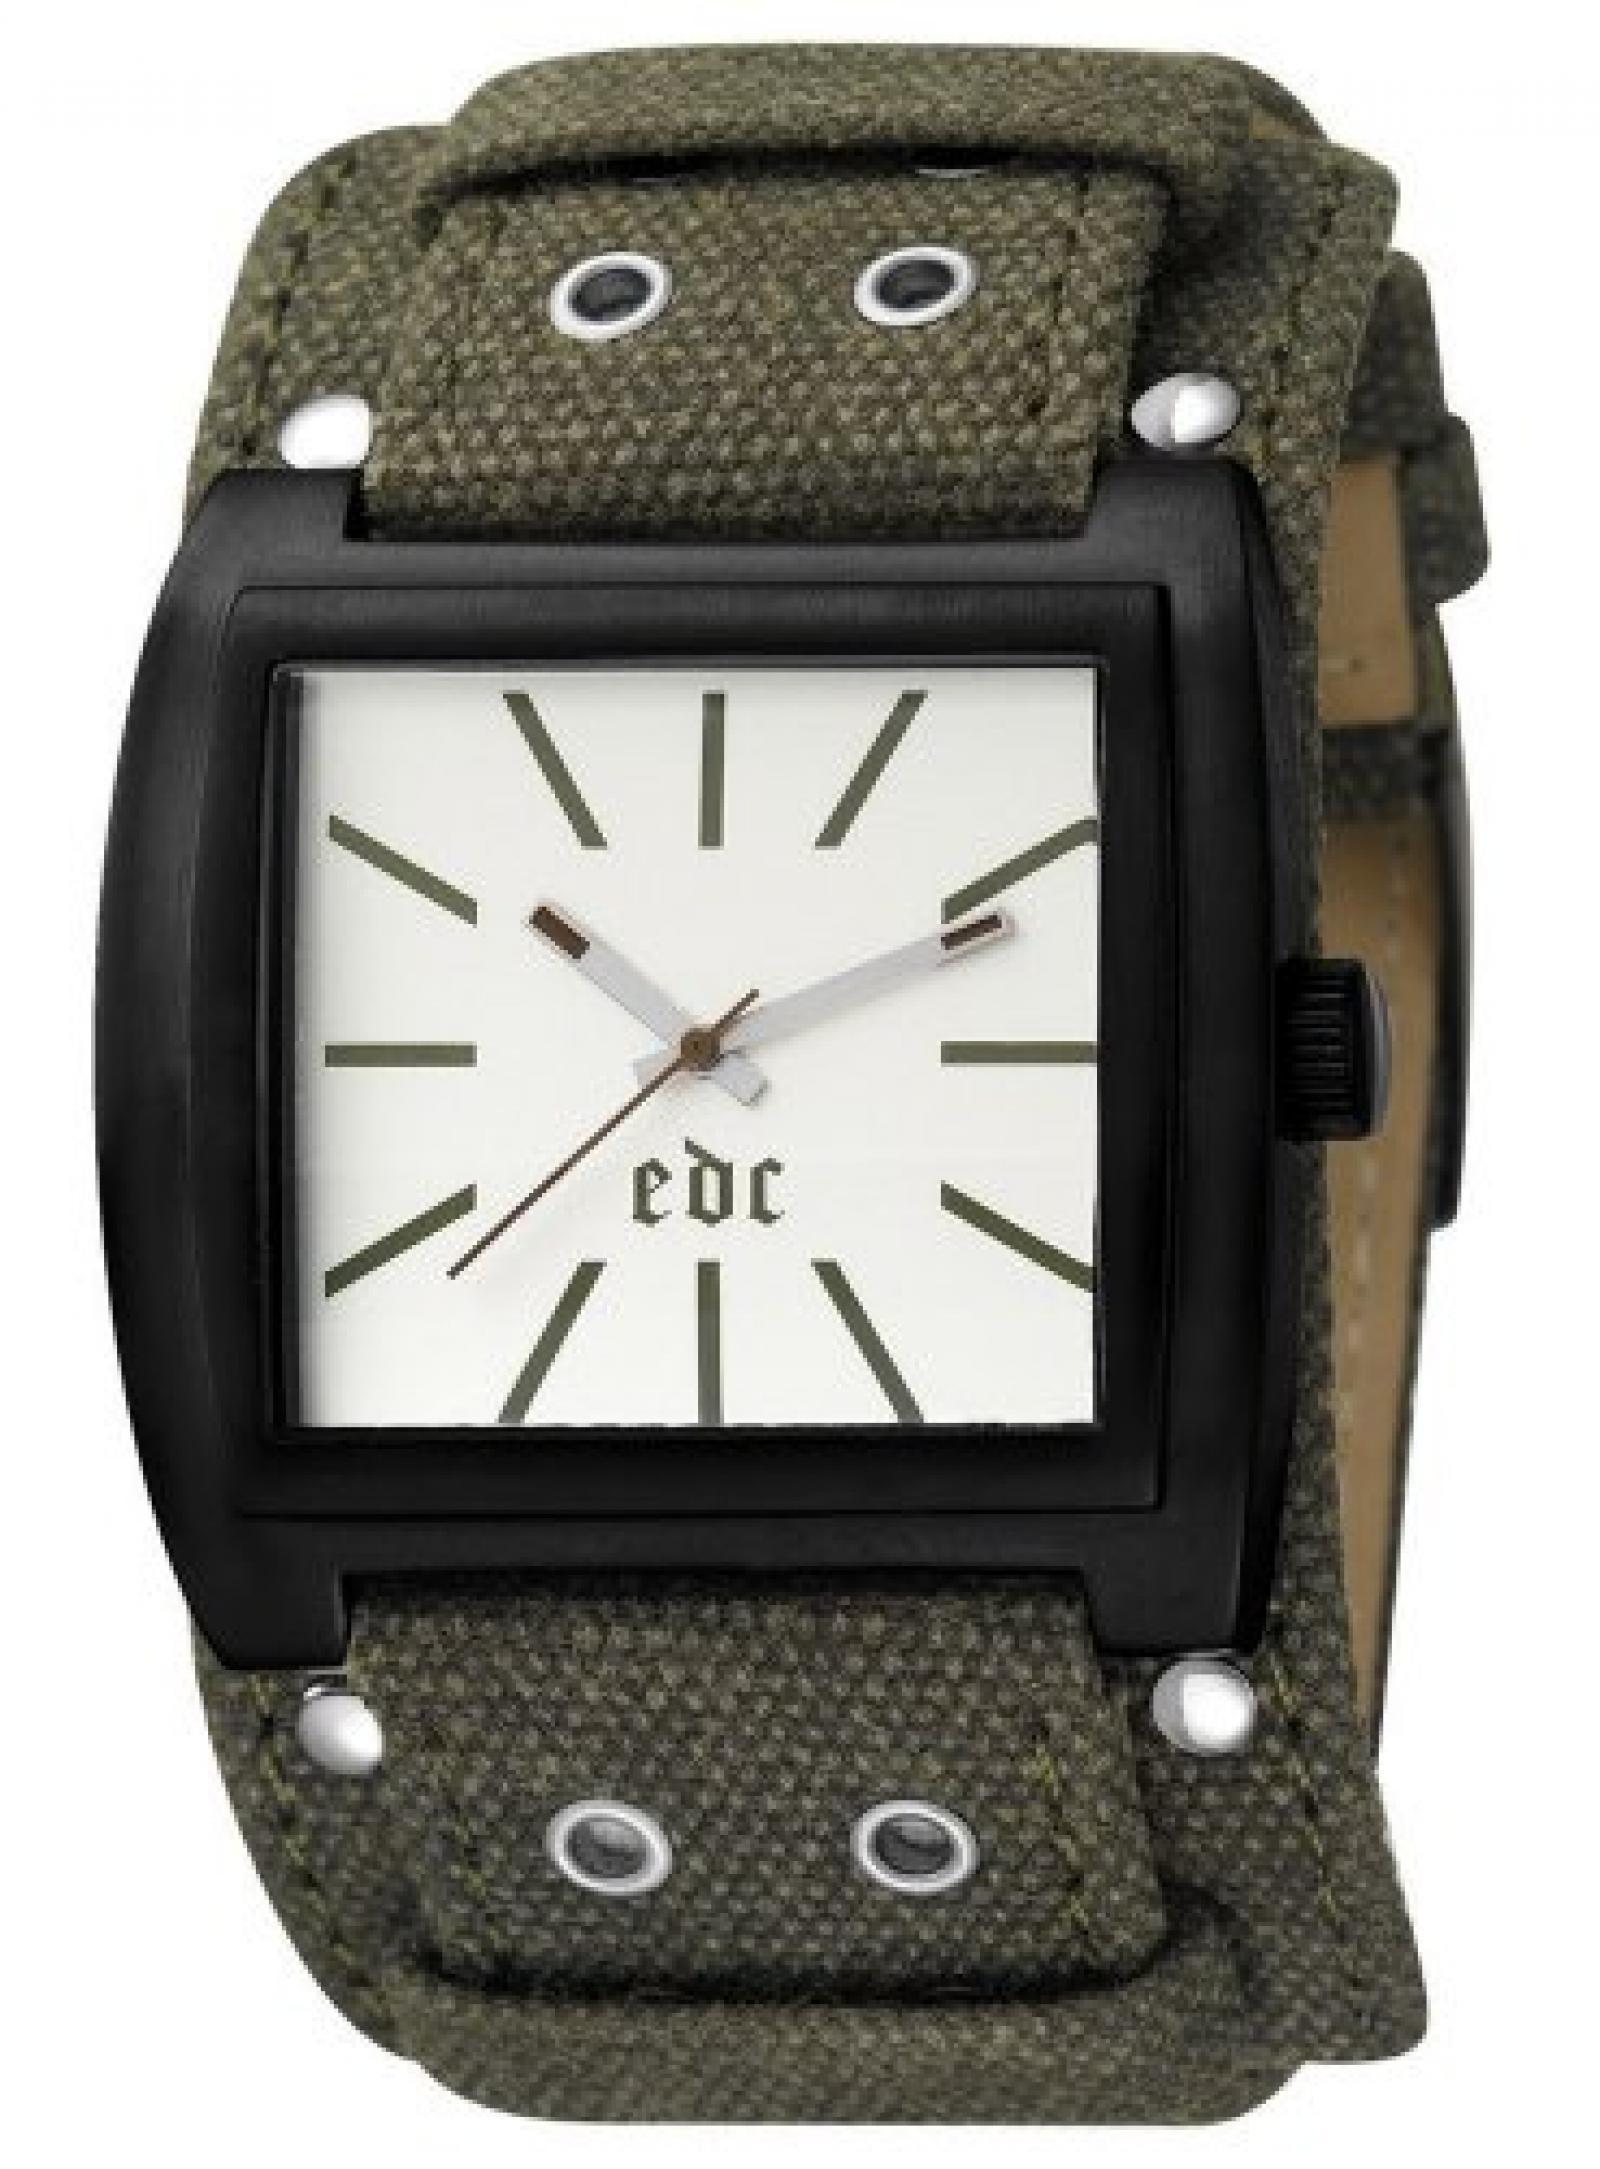 Edc Herren-Armbanduhr glorious hero - olive green Analog Quarz Leder EE100351002